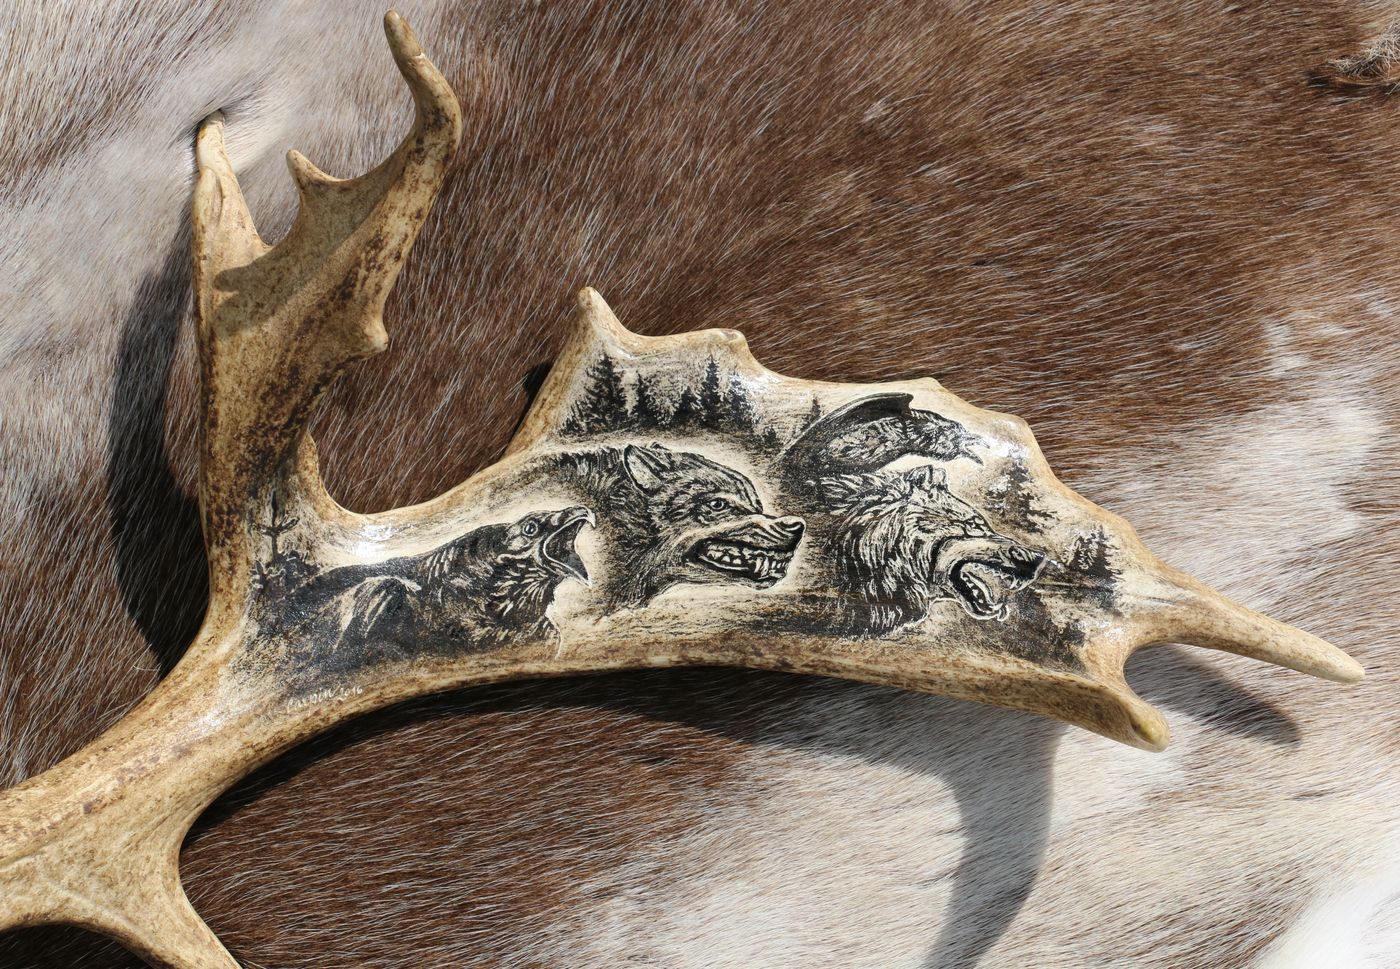 Geri freki and huginn muninn carved deer antler scrimshaw